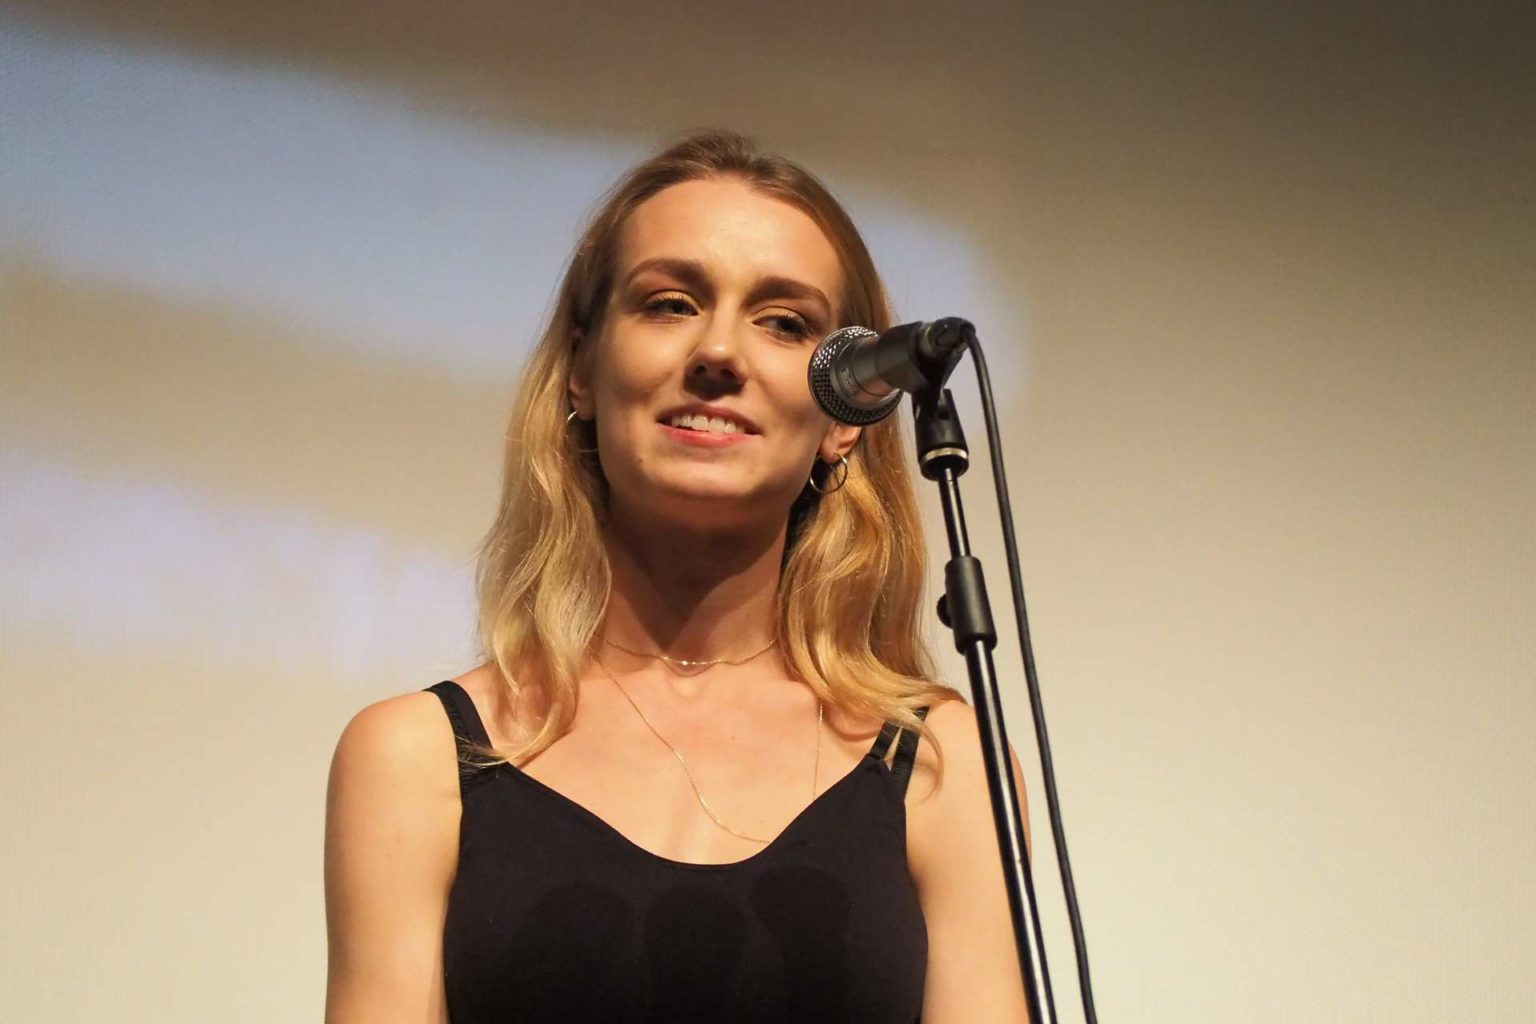 Julia Gintrowska